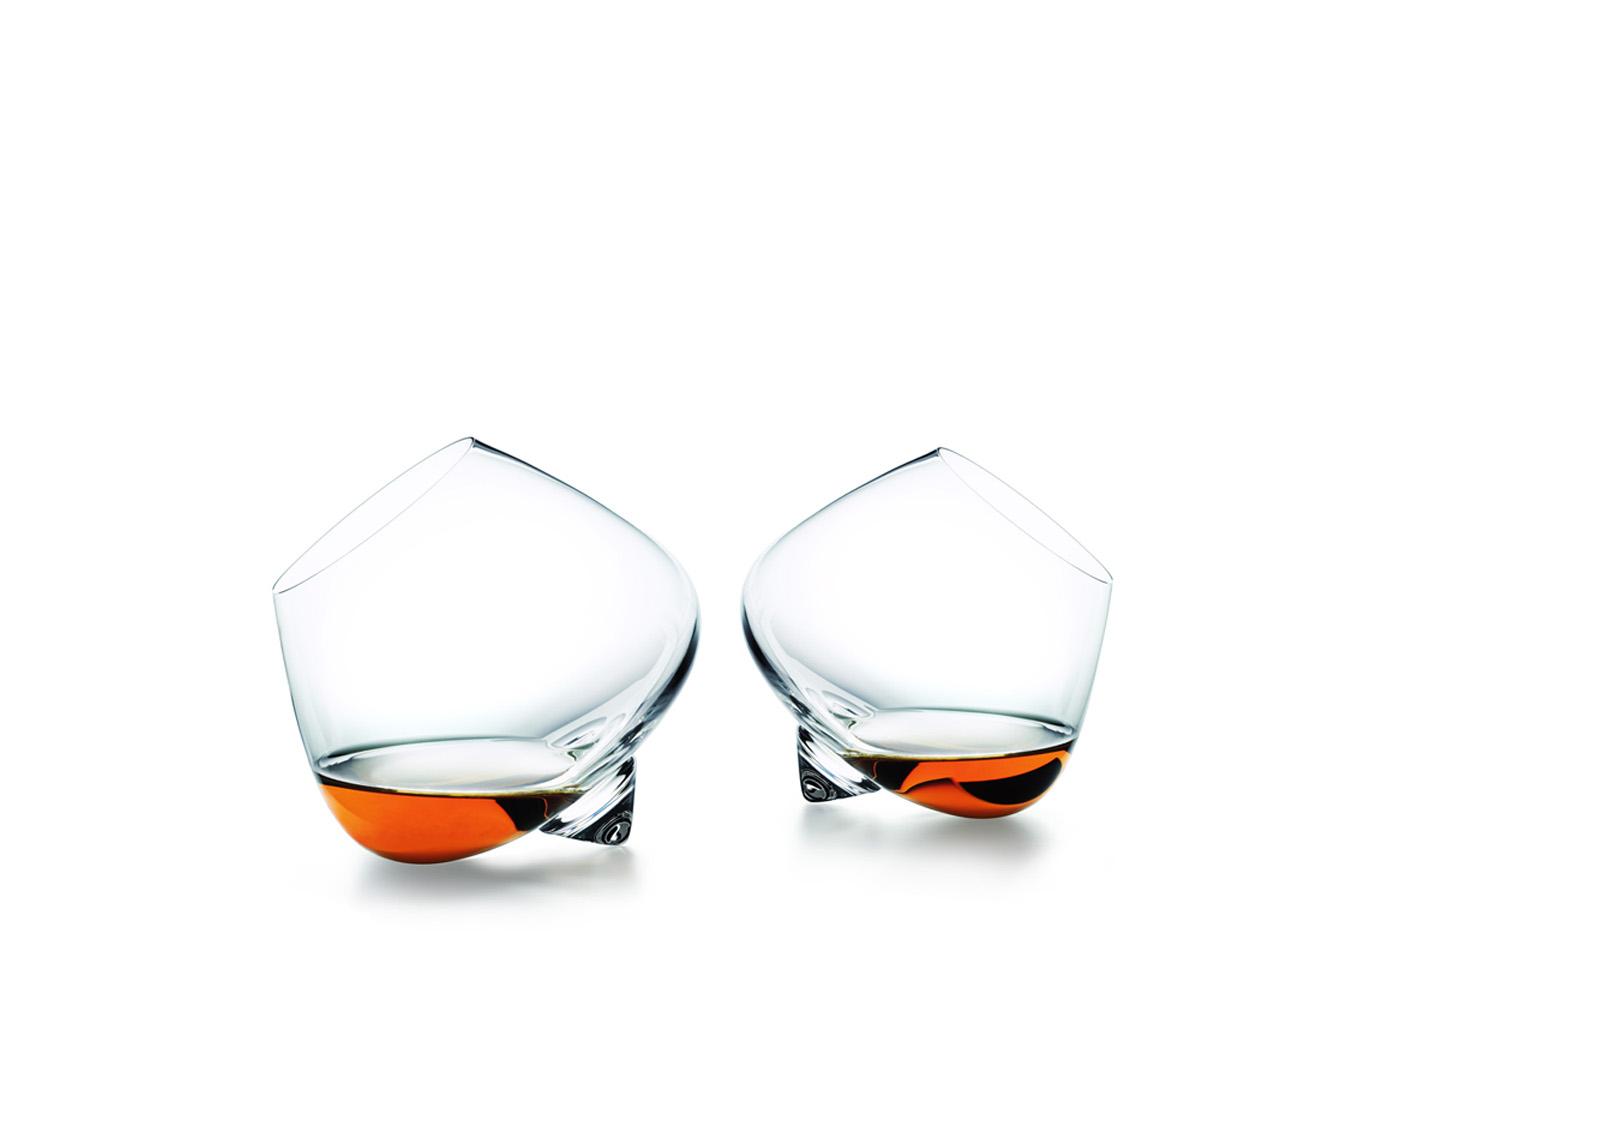 Normann Copenhagen Cognac Glasses by Rikke Hagen